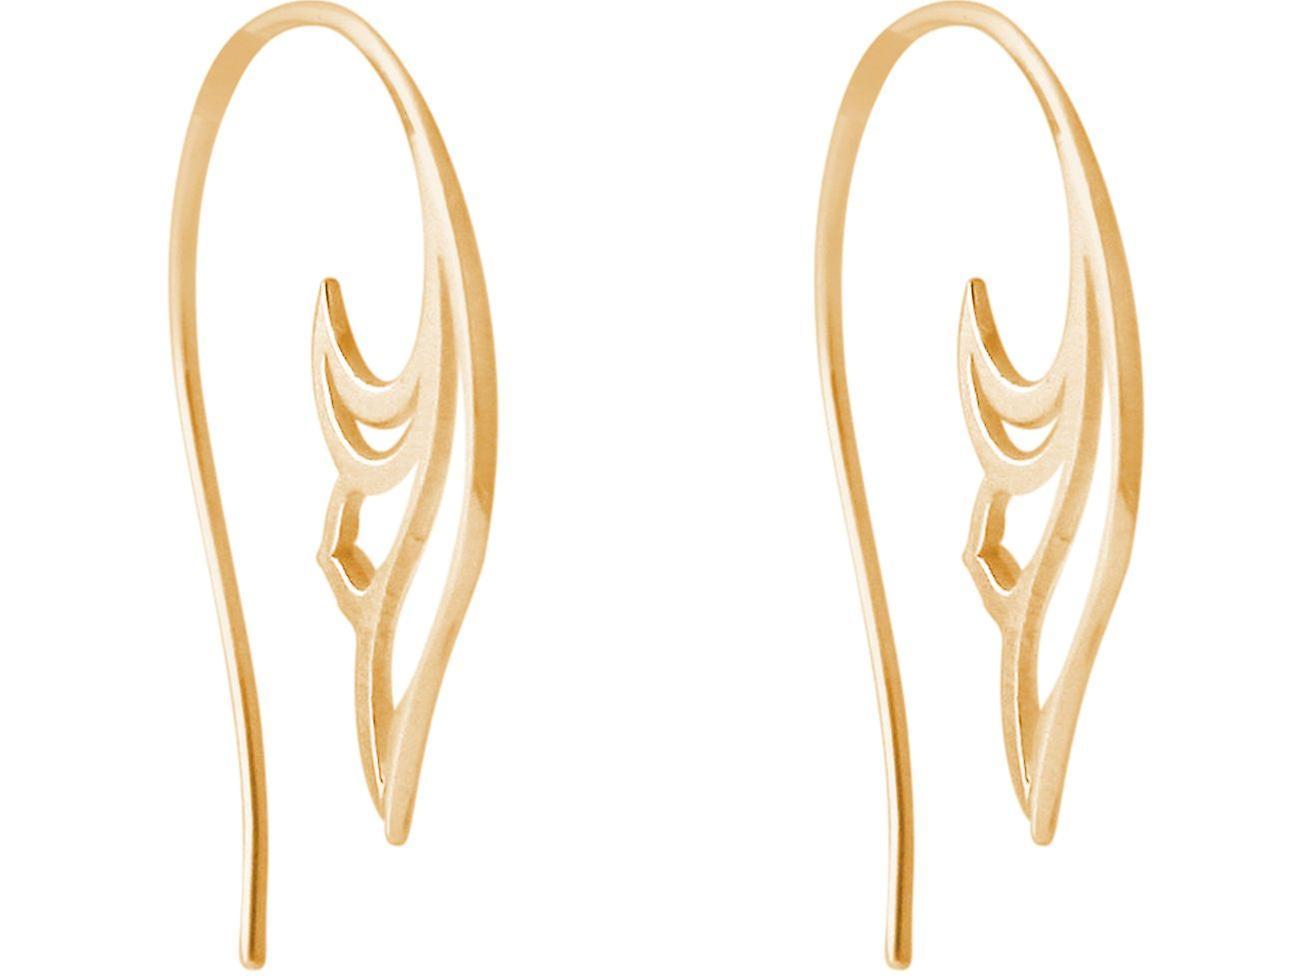 Gemshine Ohrringe Lotusblumen Scroll Creolen in 925 Silber, vergoldet oder rose